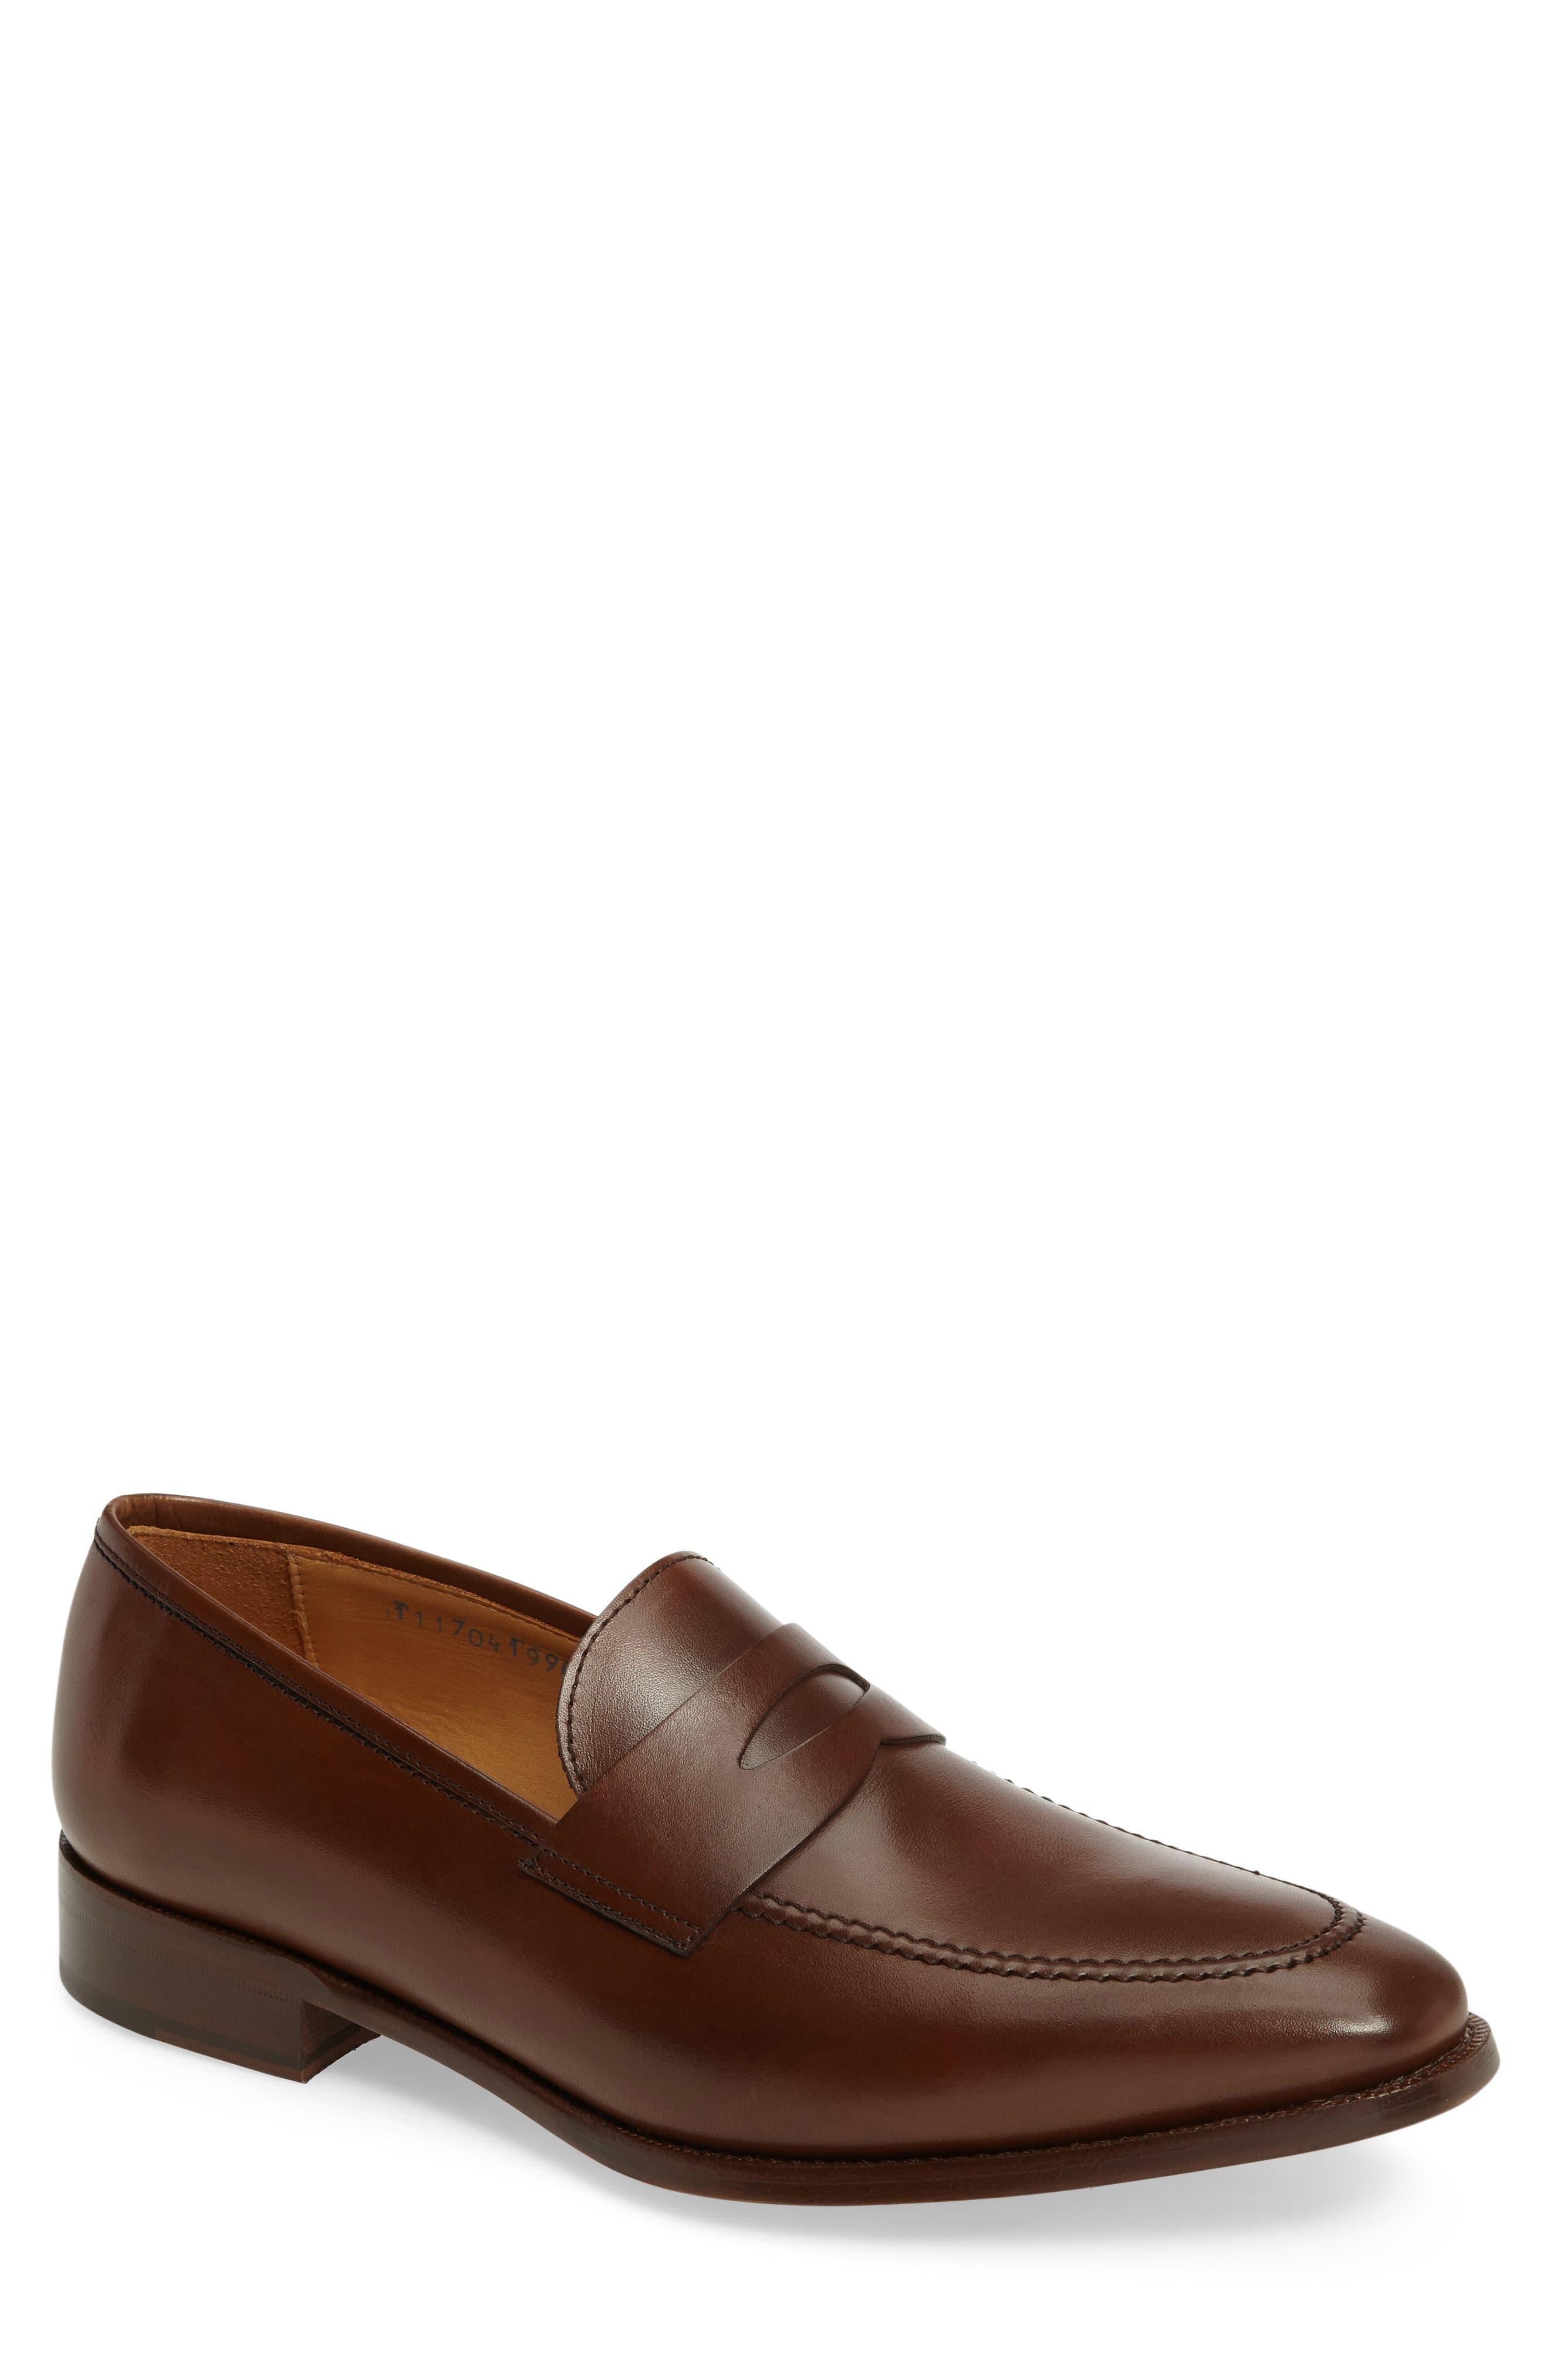 Abe Penny Loafer,                         Main,                         color, Hazelnut Leather